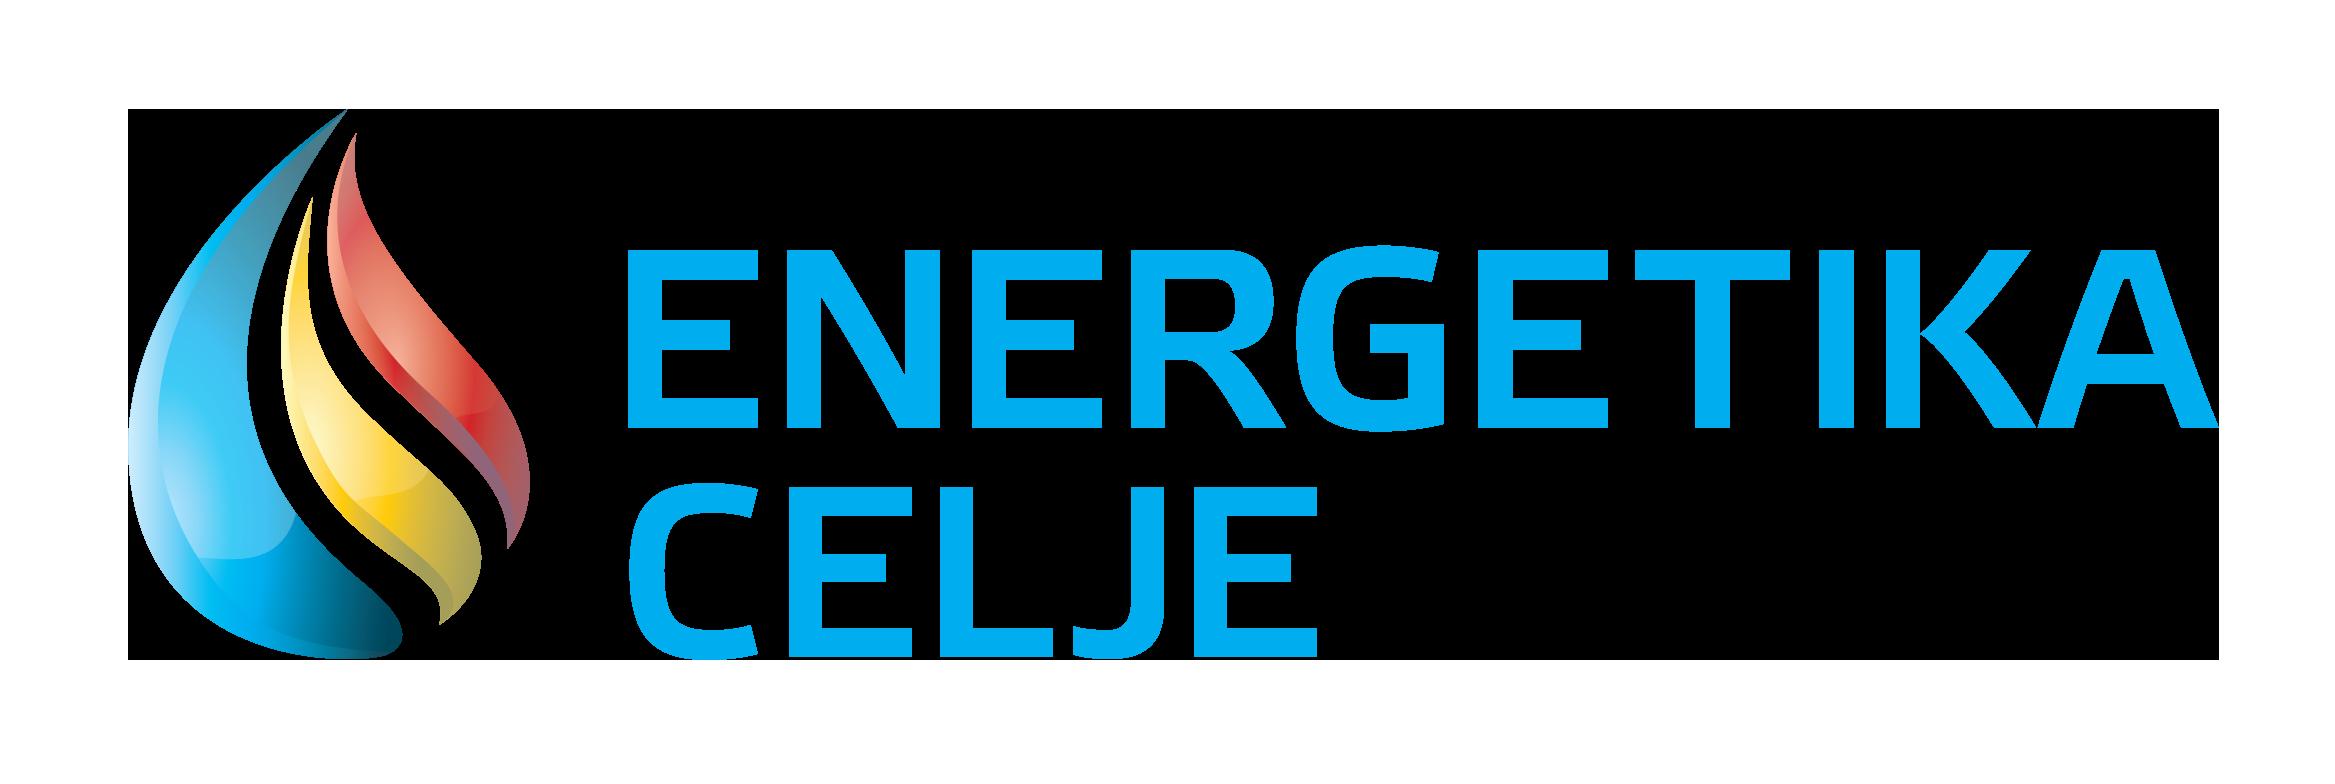 Energetika_Logo